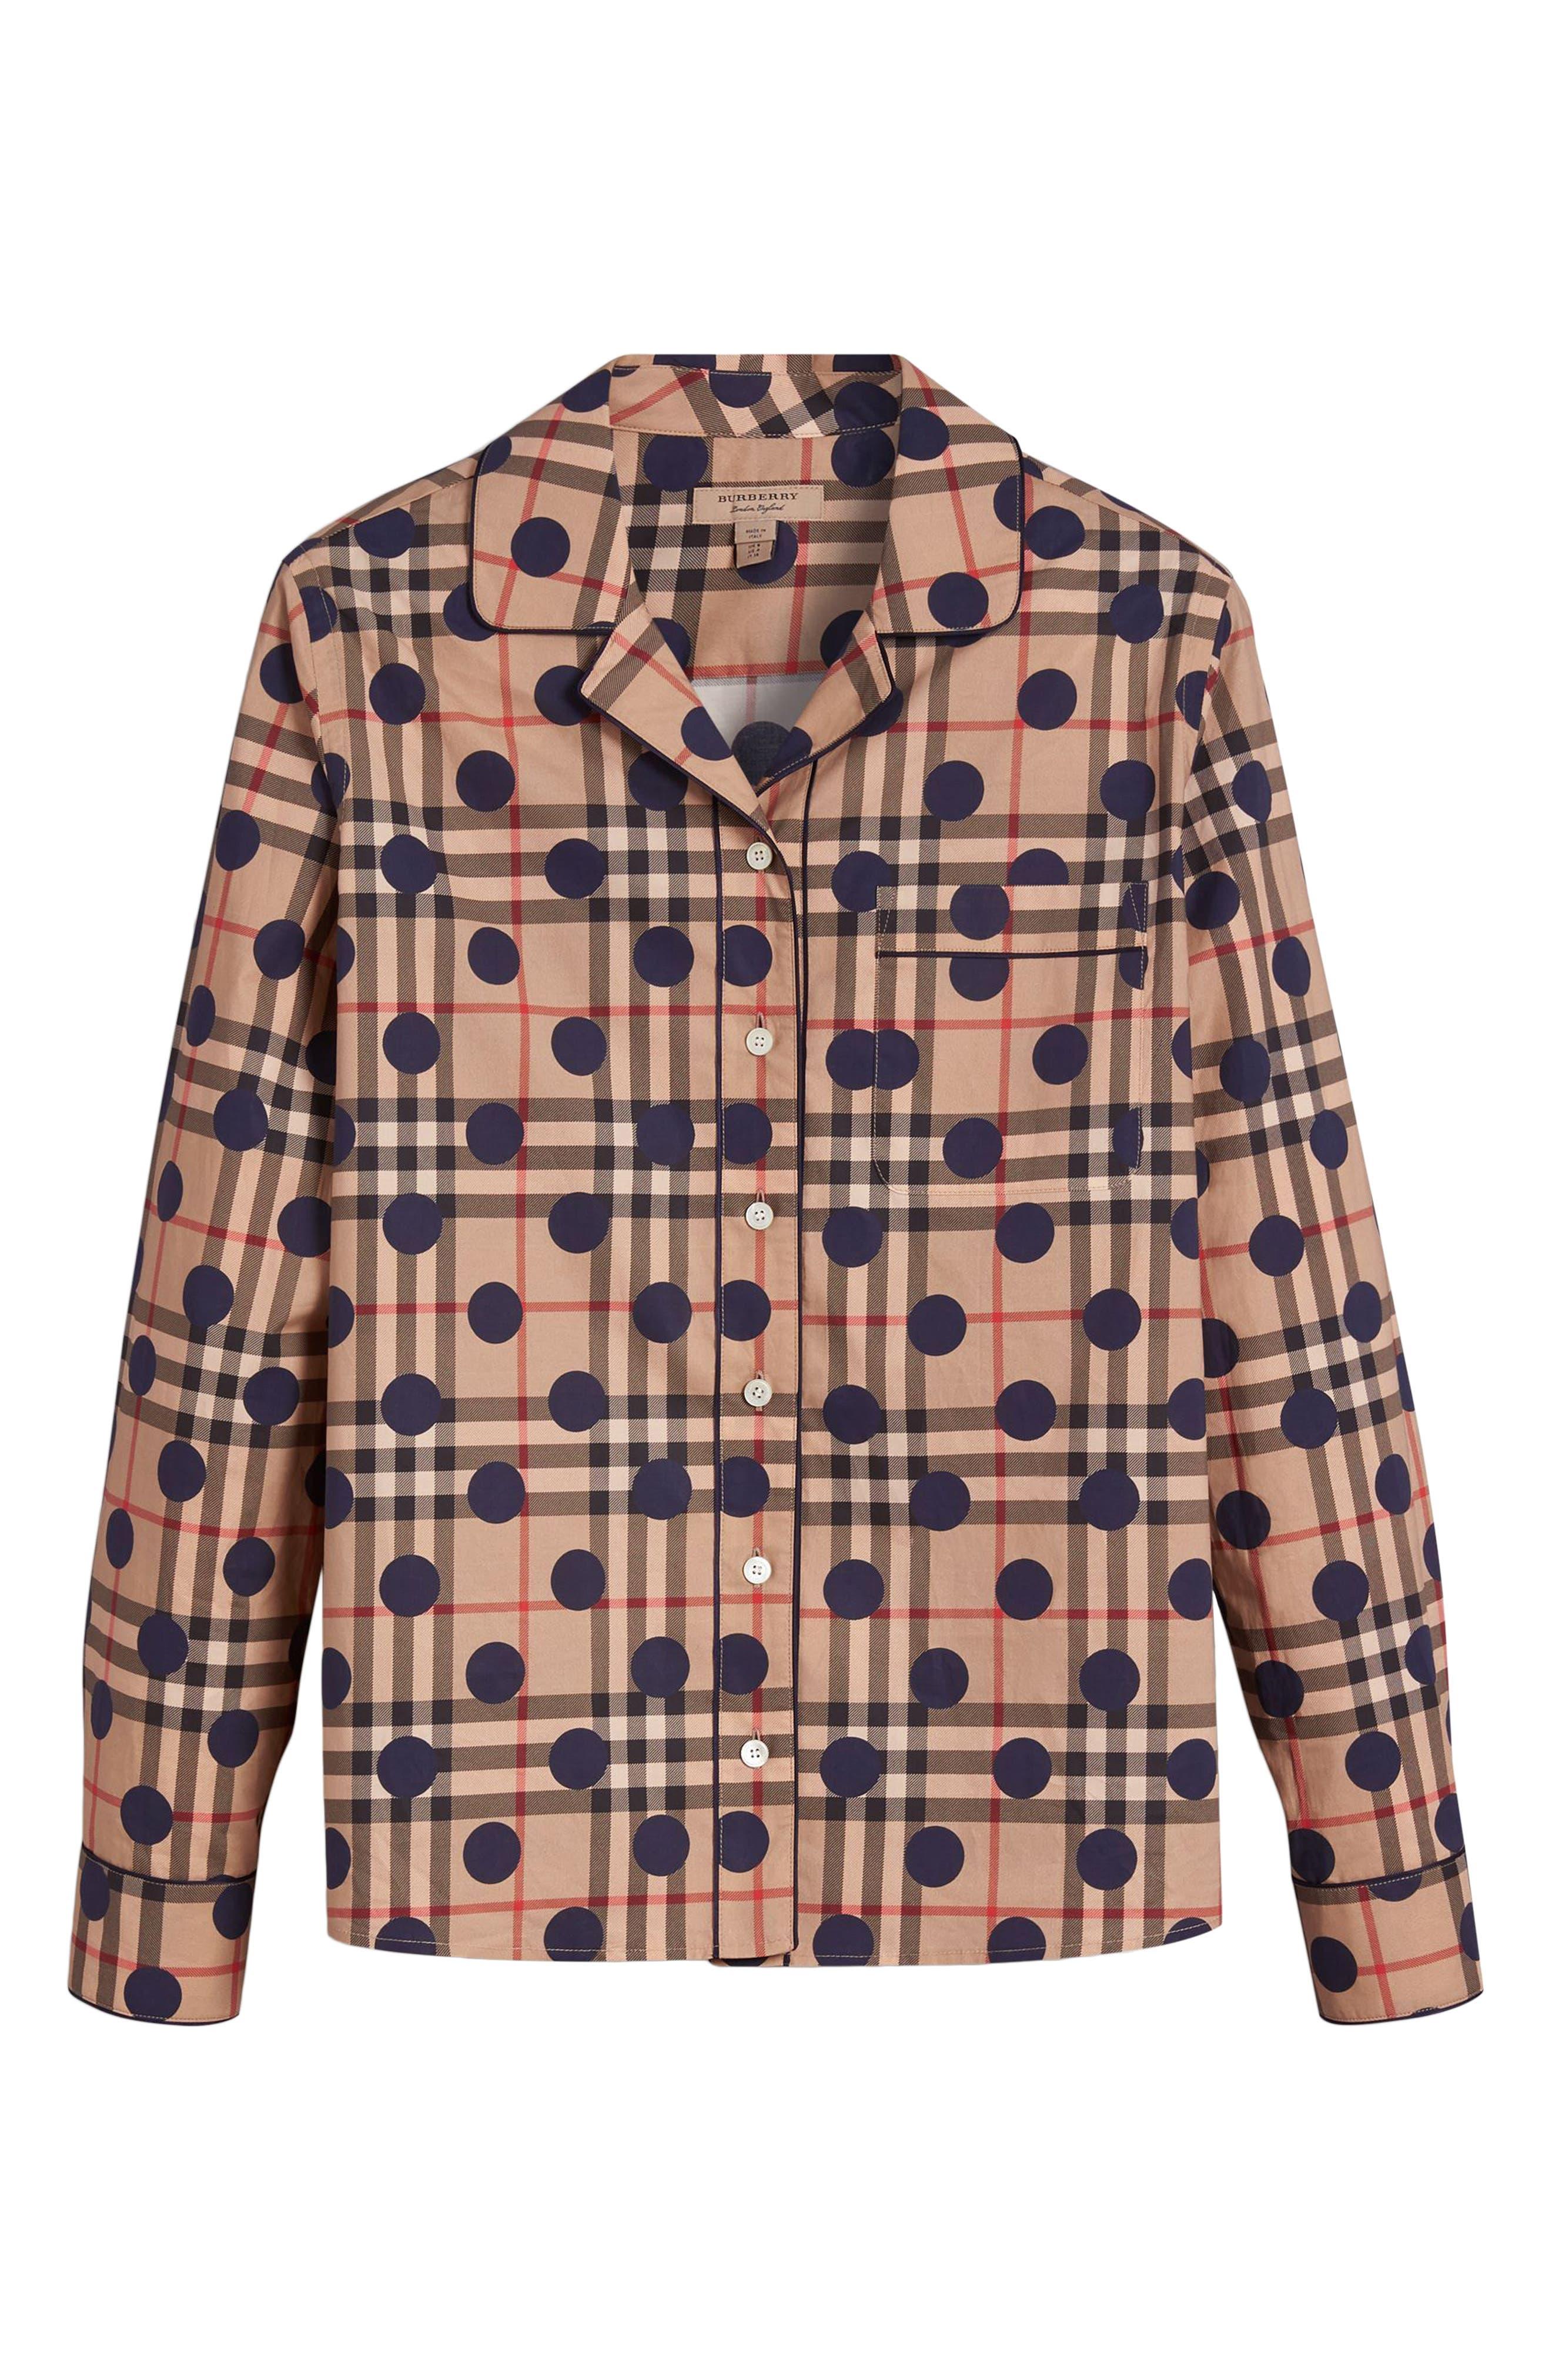 Polka Dot Check Print Cotton Shirt,                             Alternate thumbnail 4, color,